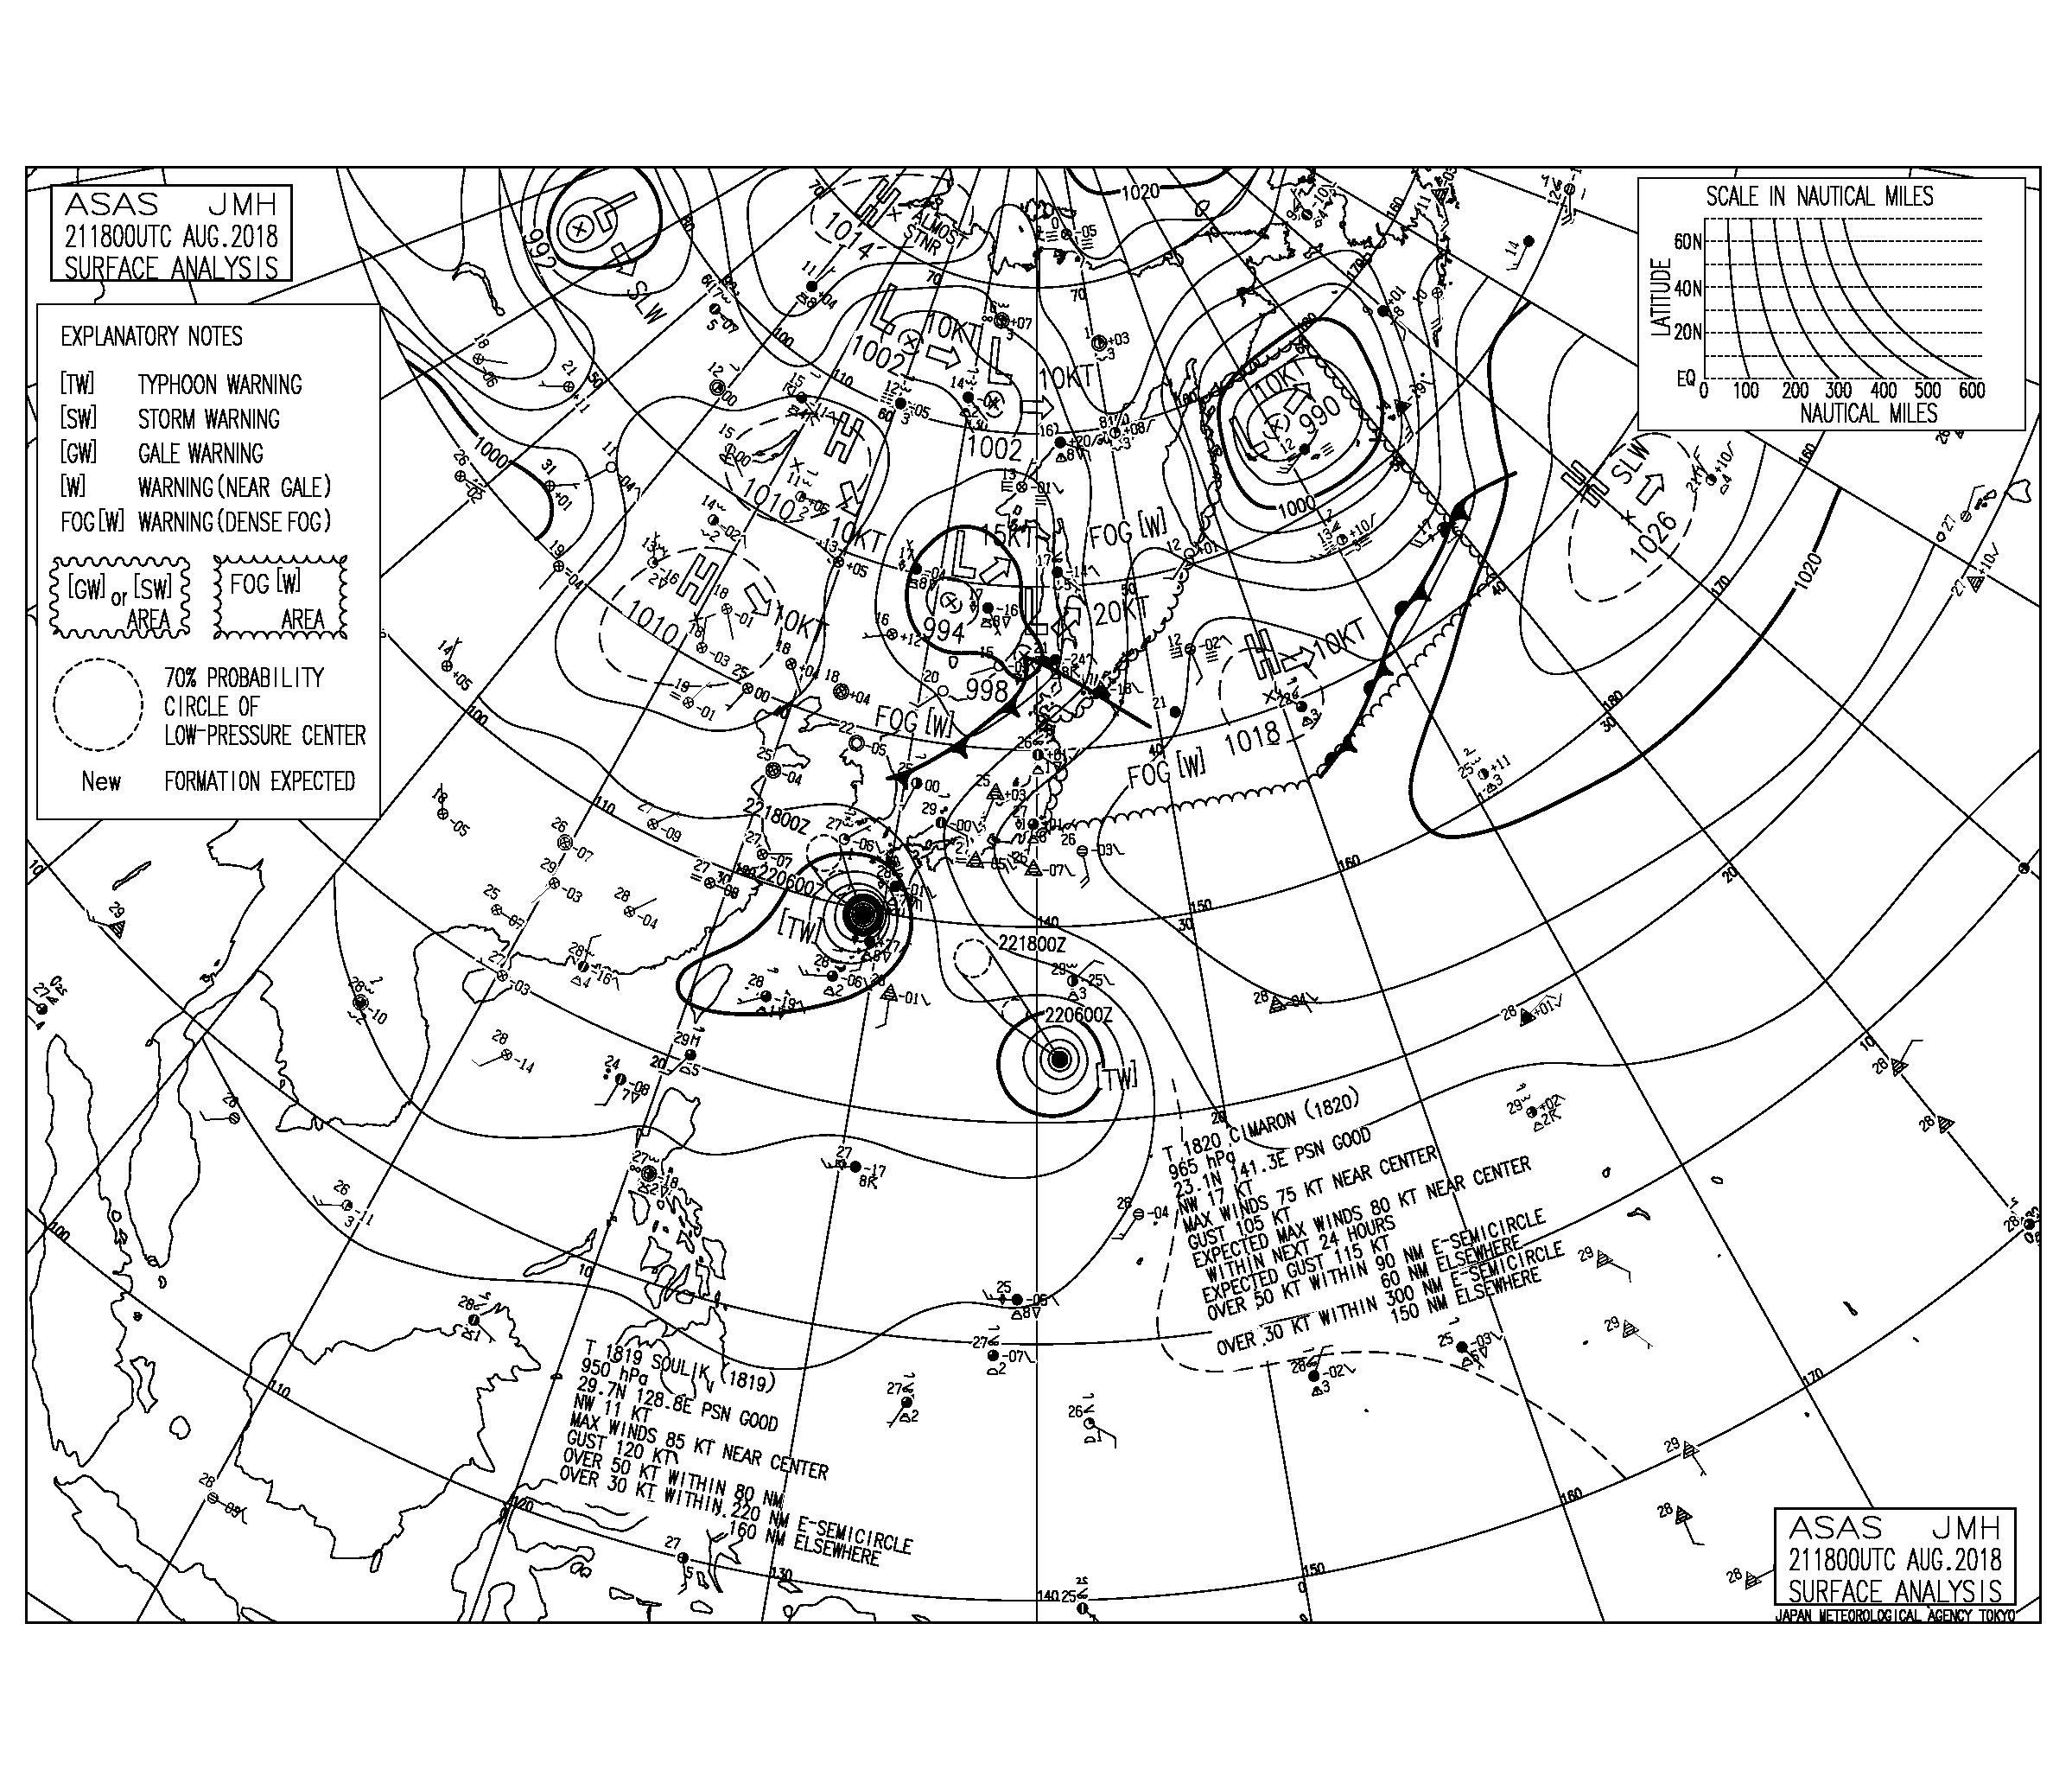 8/22 3:00 ASAS 気圧配置と波情報〜これからさらにうねり強まりクローズへ、台風20号の接近時の速度を要注視